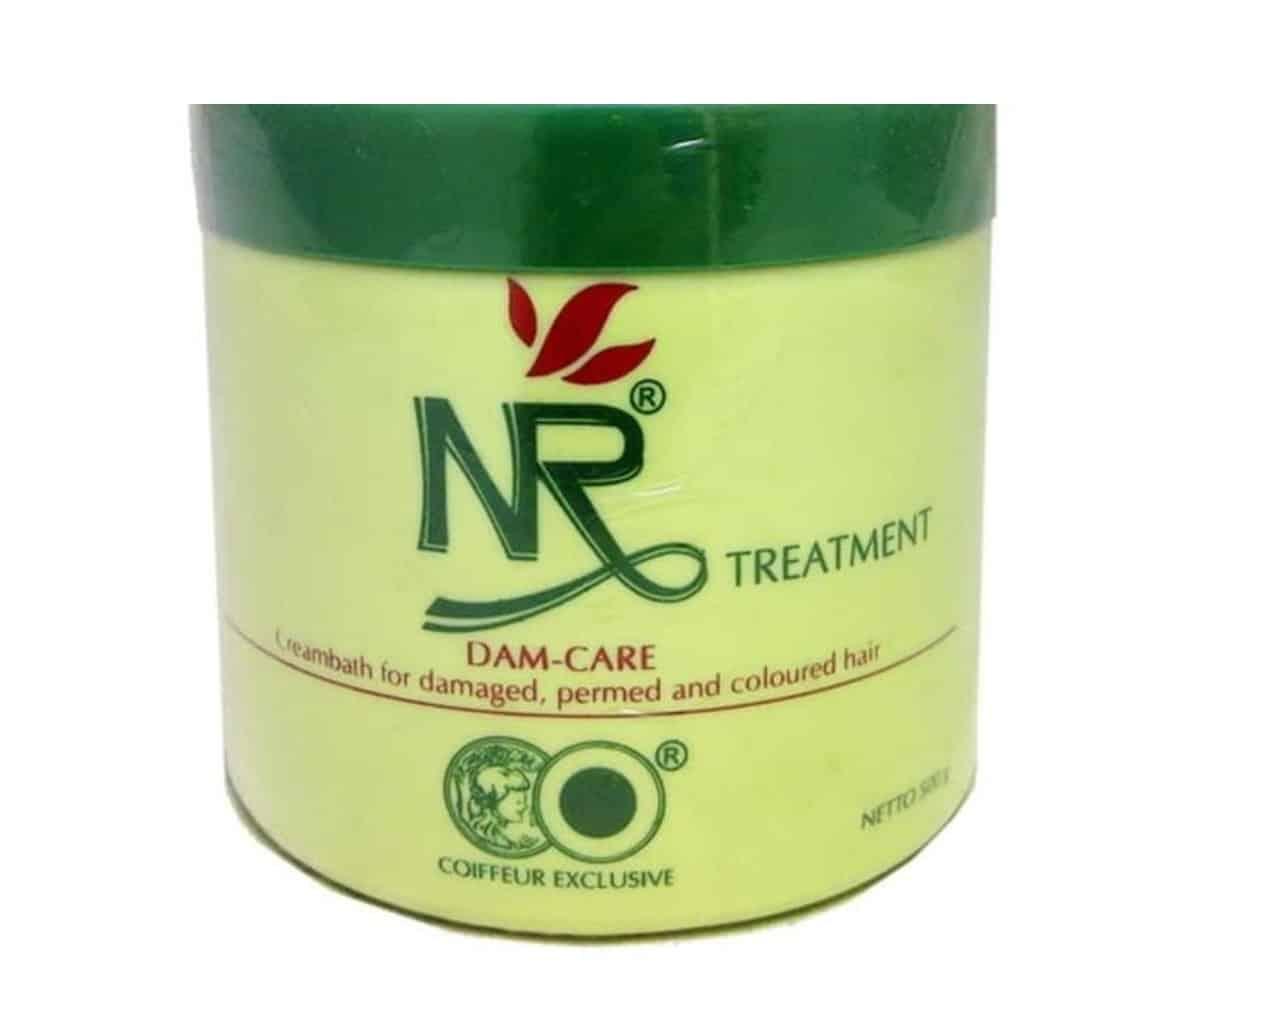 NR-treatment-khusus-creambath